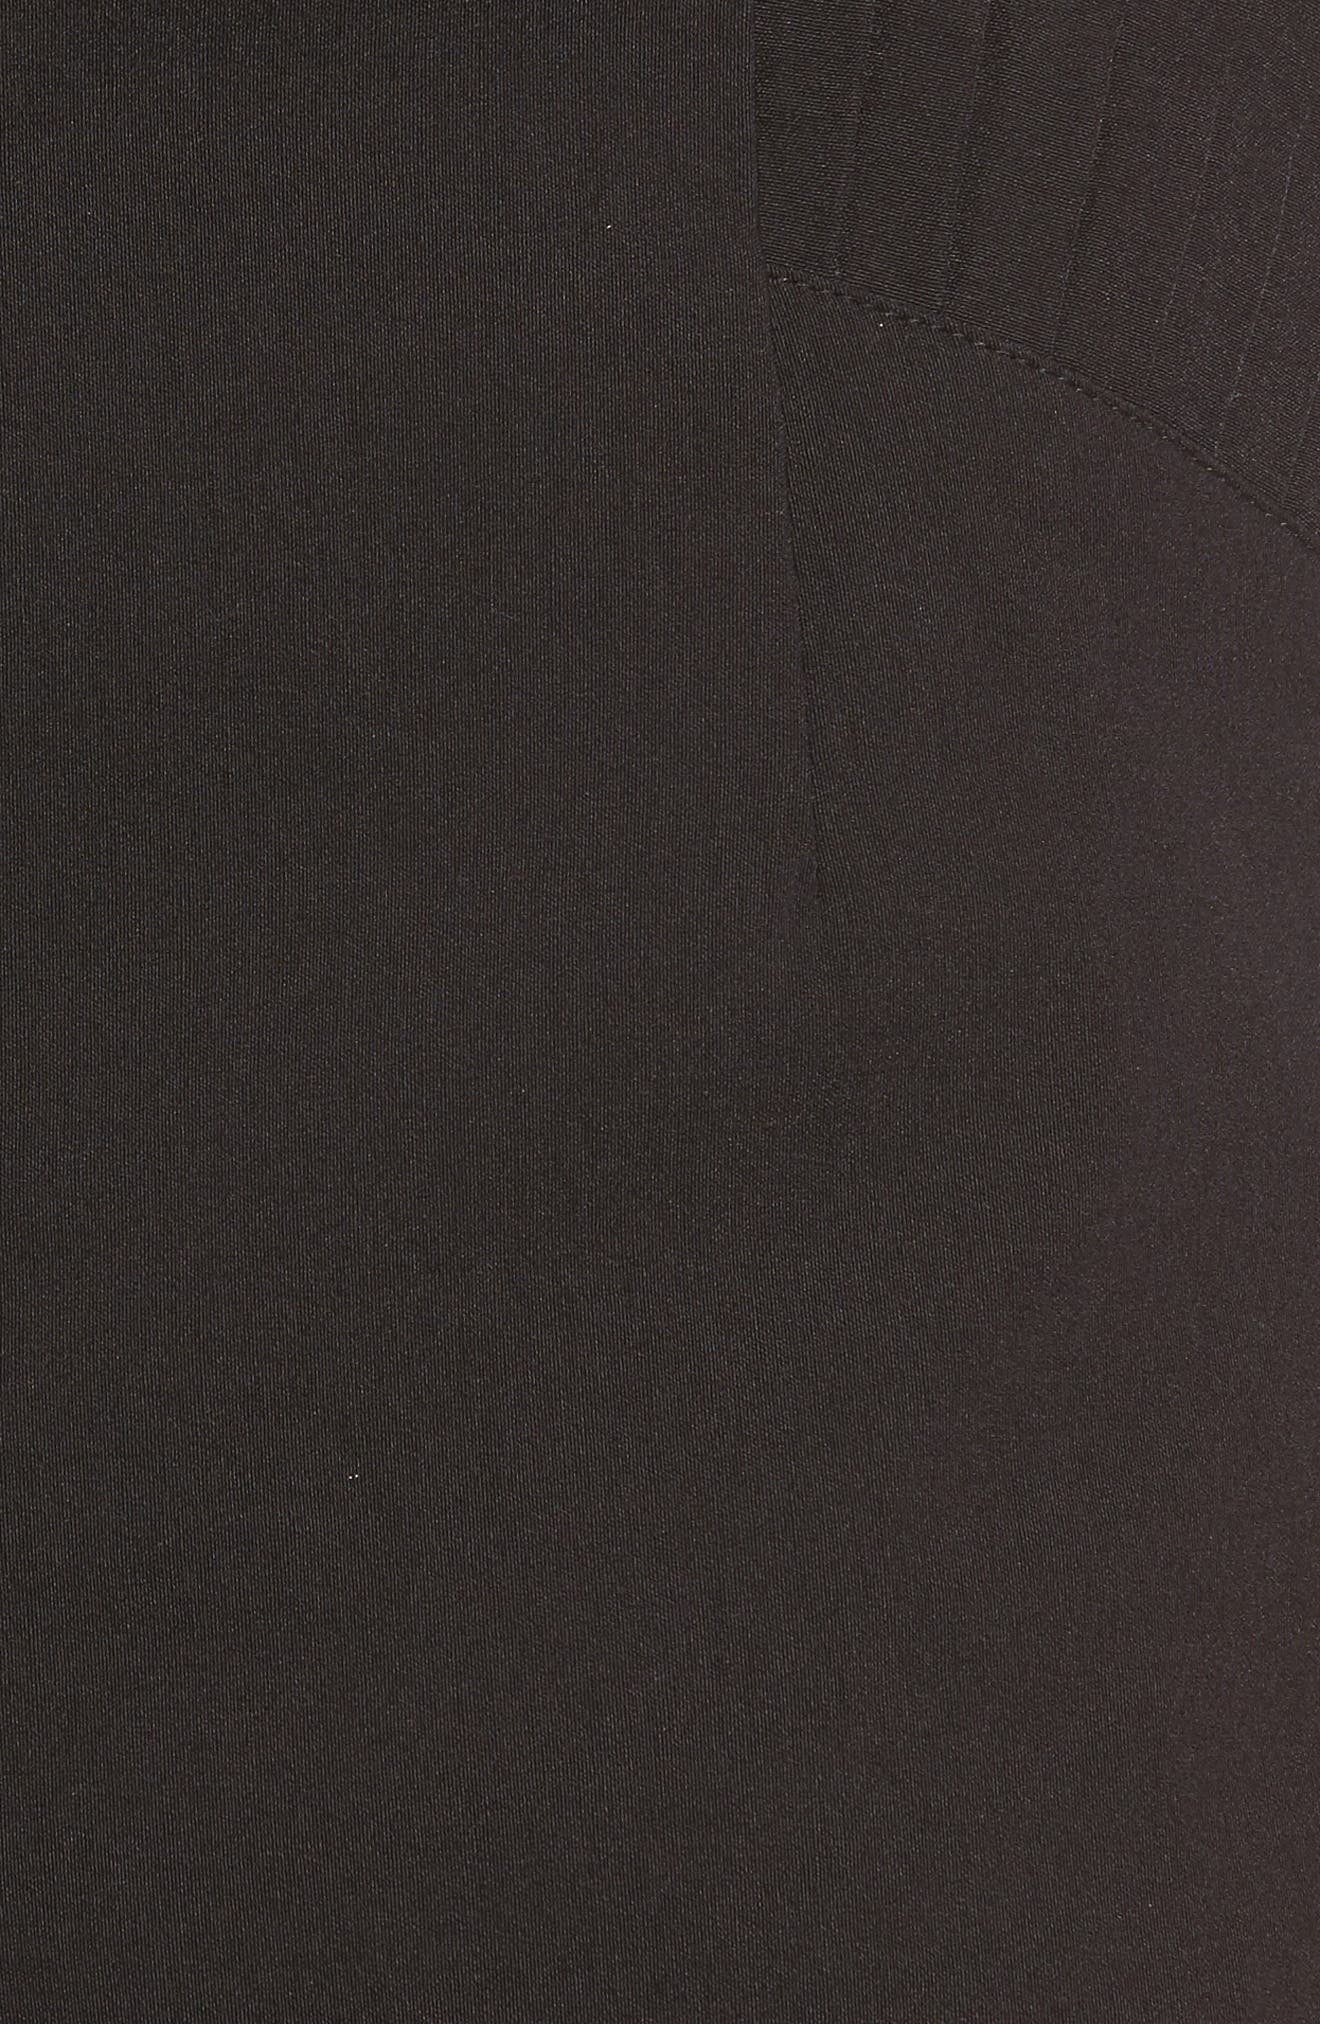 Pleat Trim High Waist Shorts,                             Alternate thumbnail 5, color,                             Black